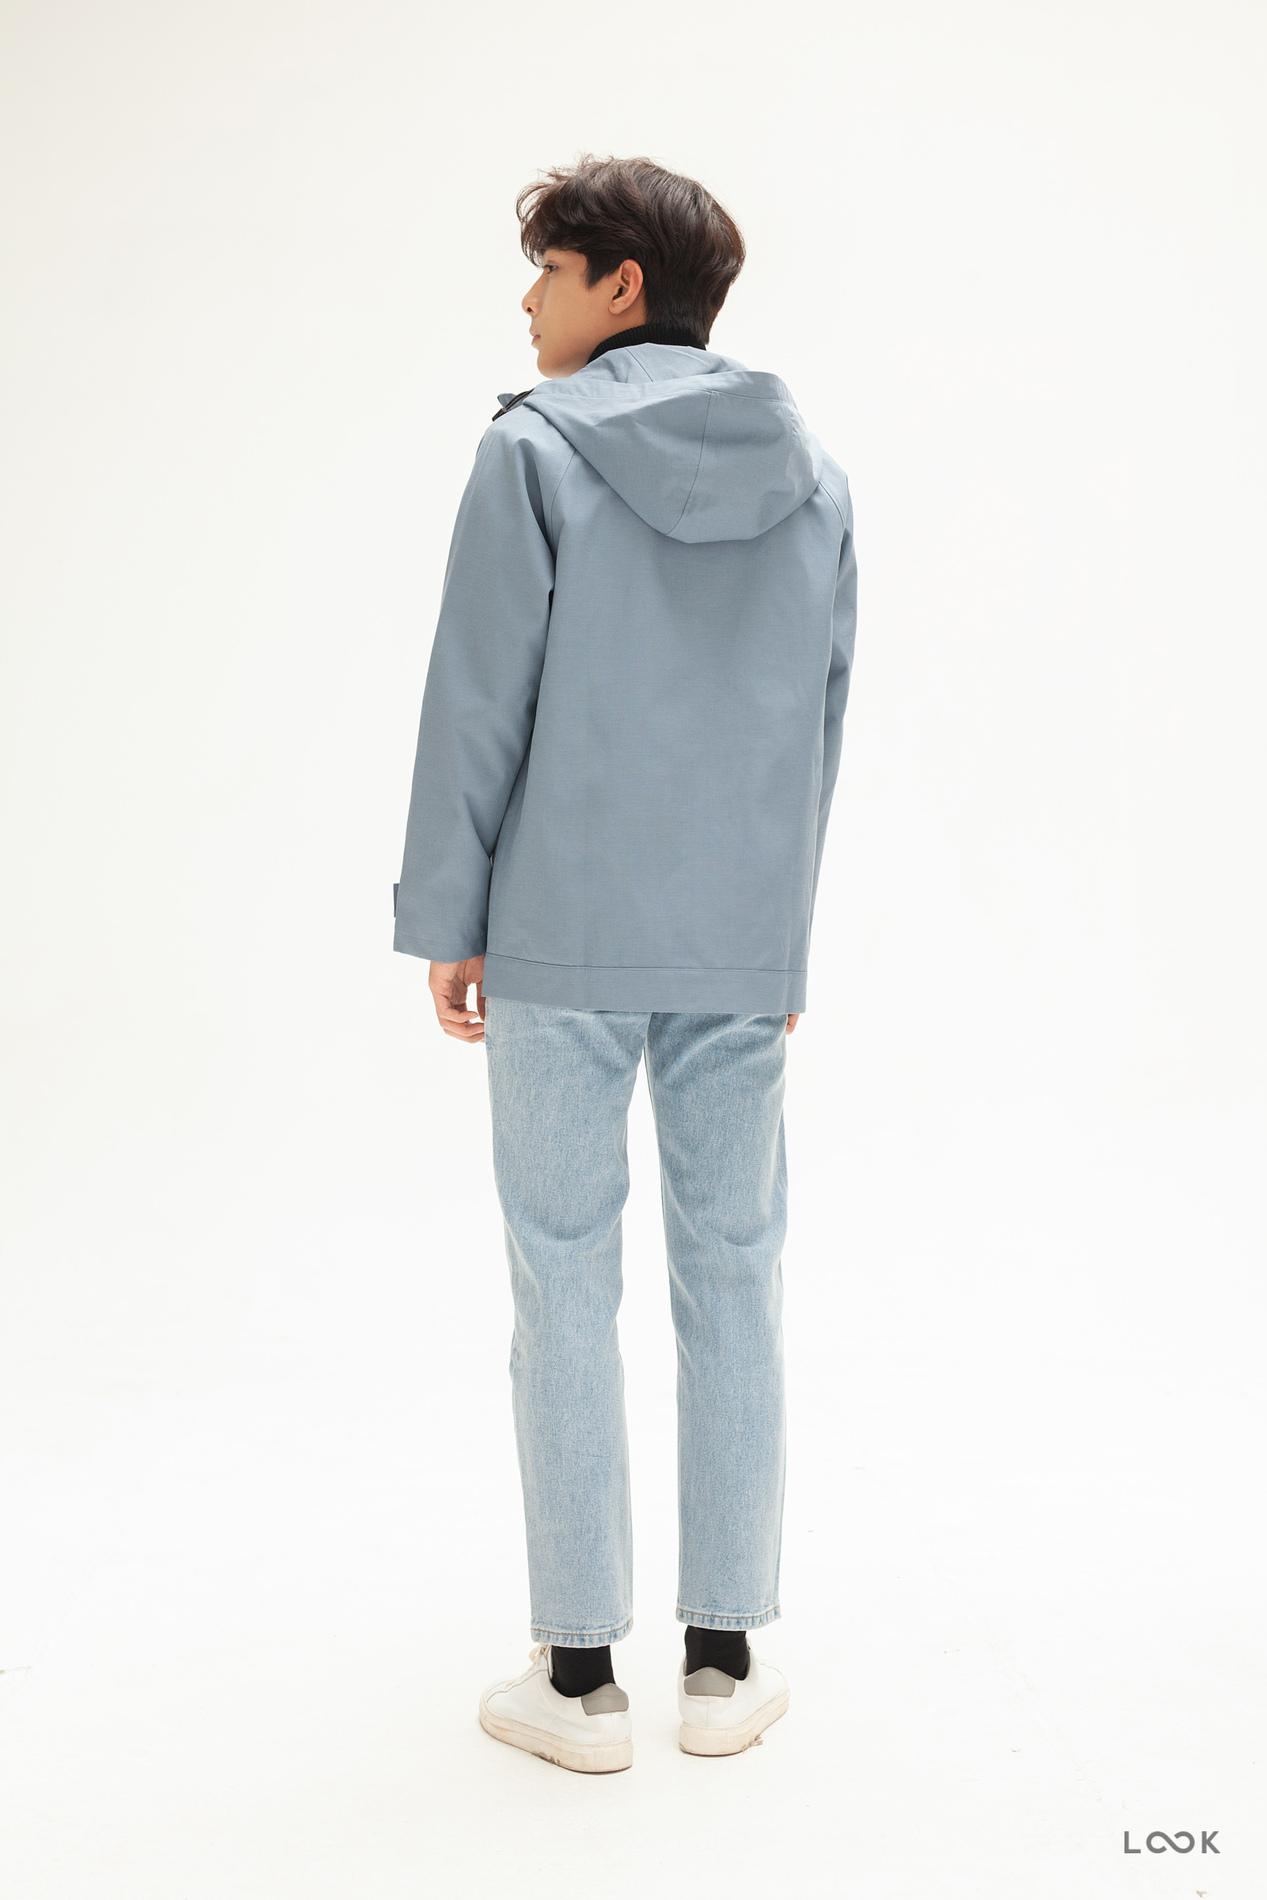 Look Raincoat Jacket